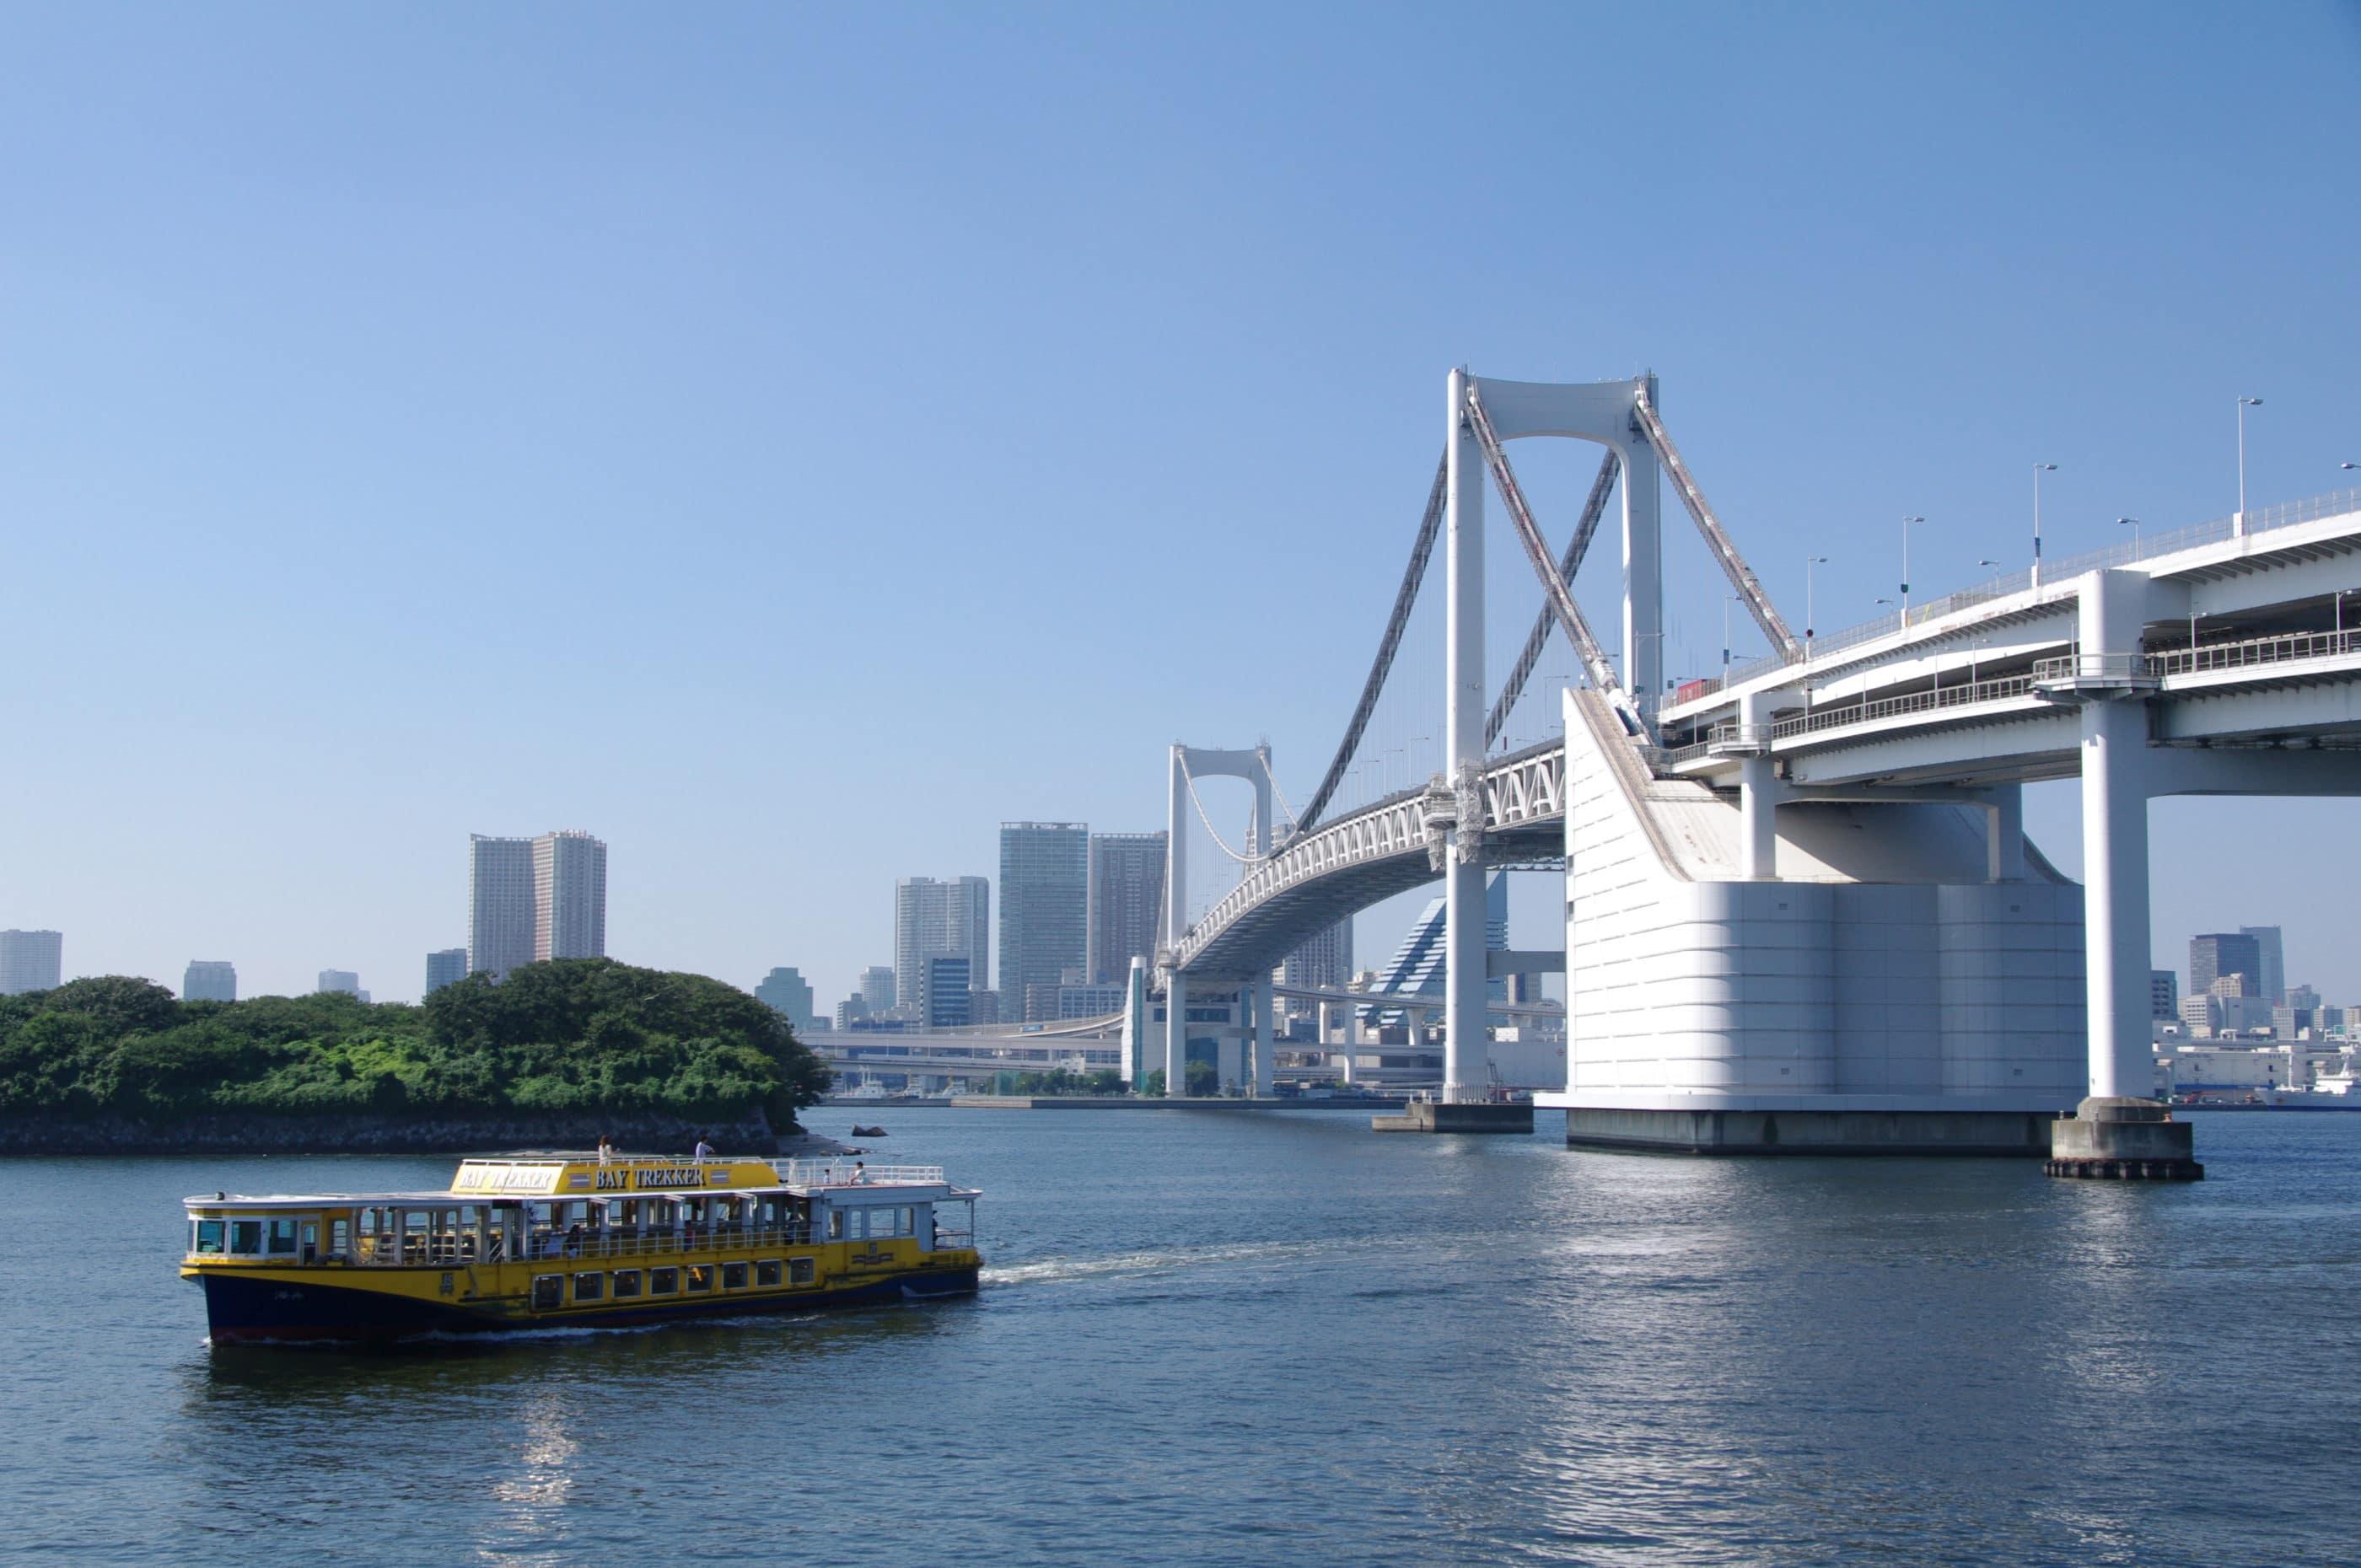 A tour boat on the water near the Rainbow Bridge to Odaiba island.